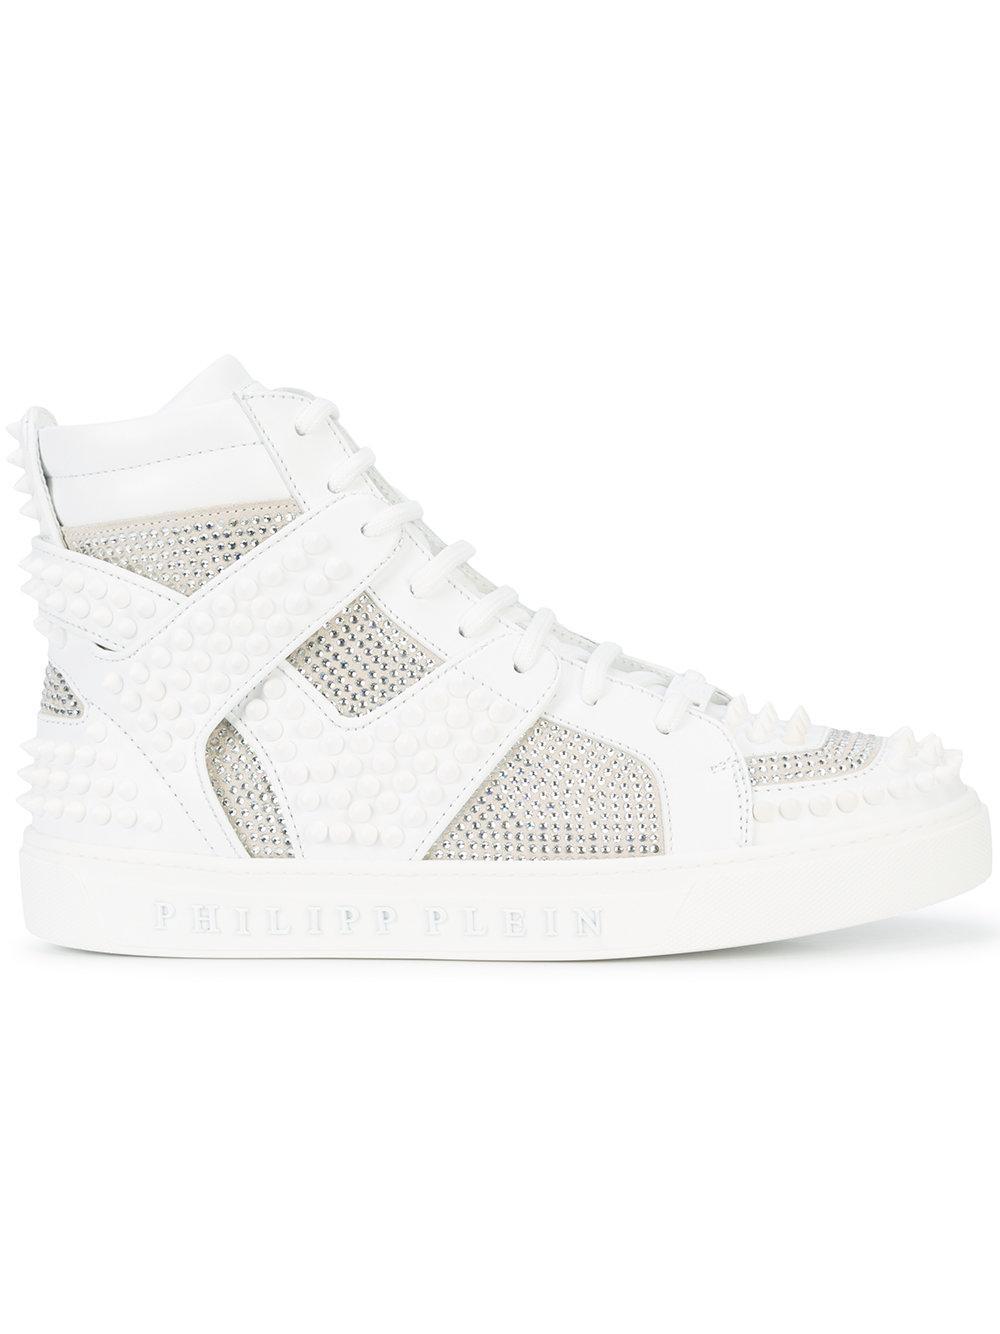 b0bfb8a688 Philipp Plein Embellished Hi-Top Sneakers | ModeSens